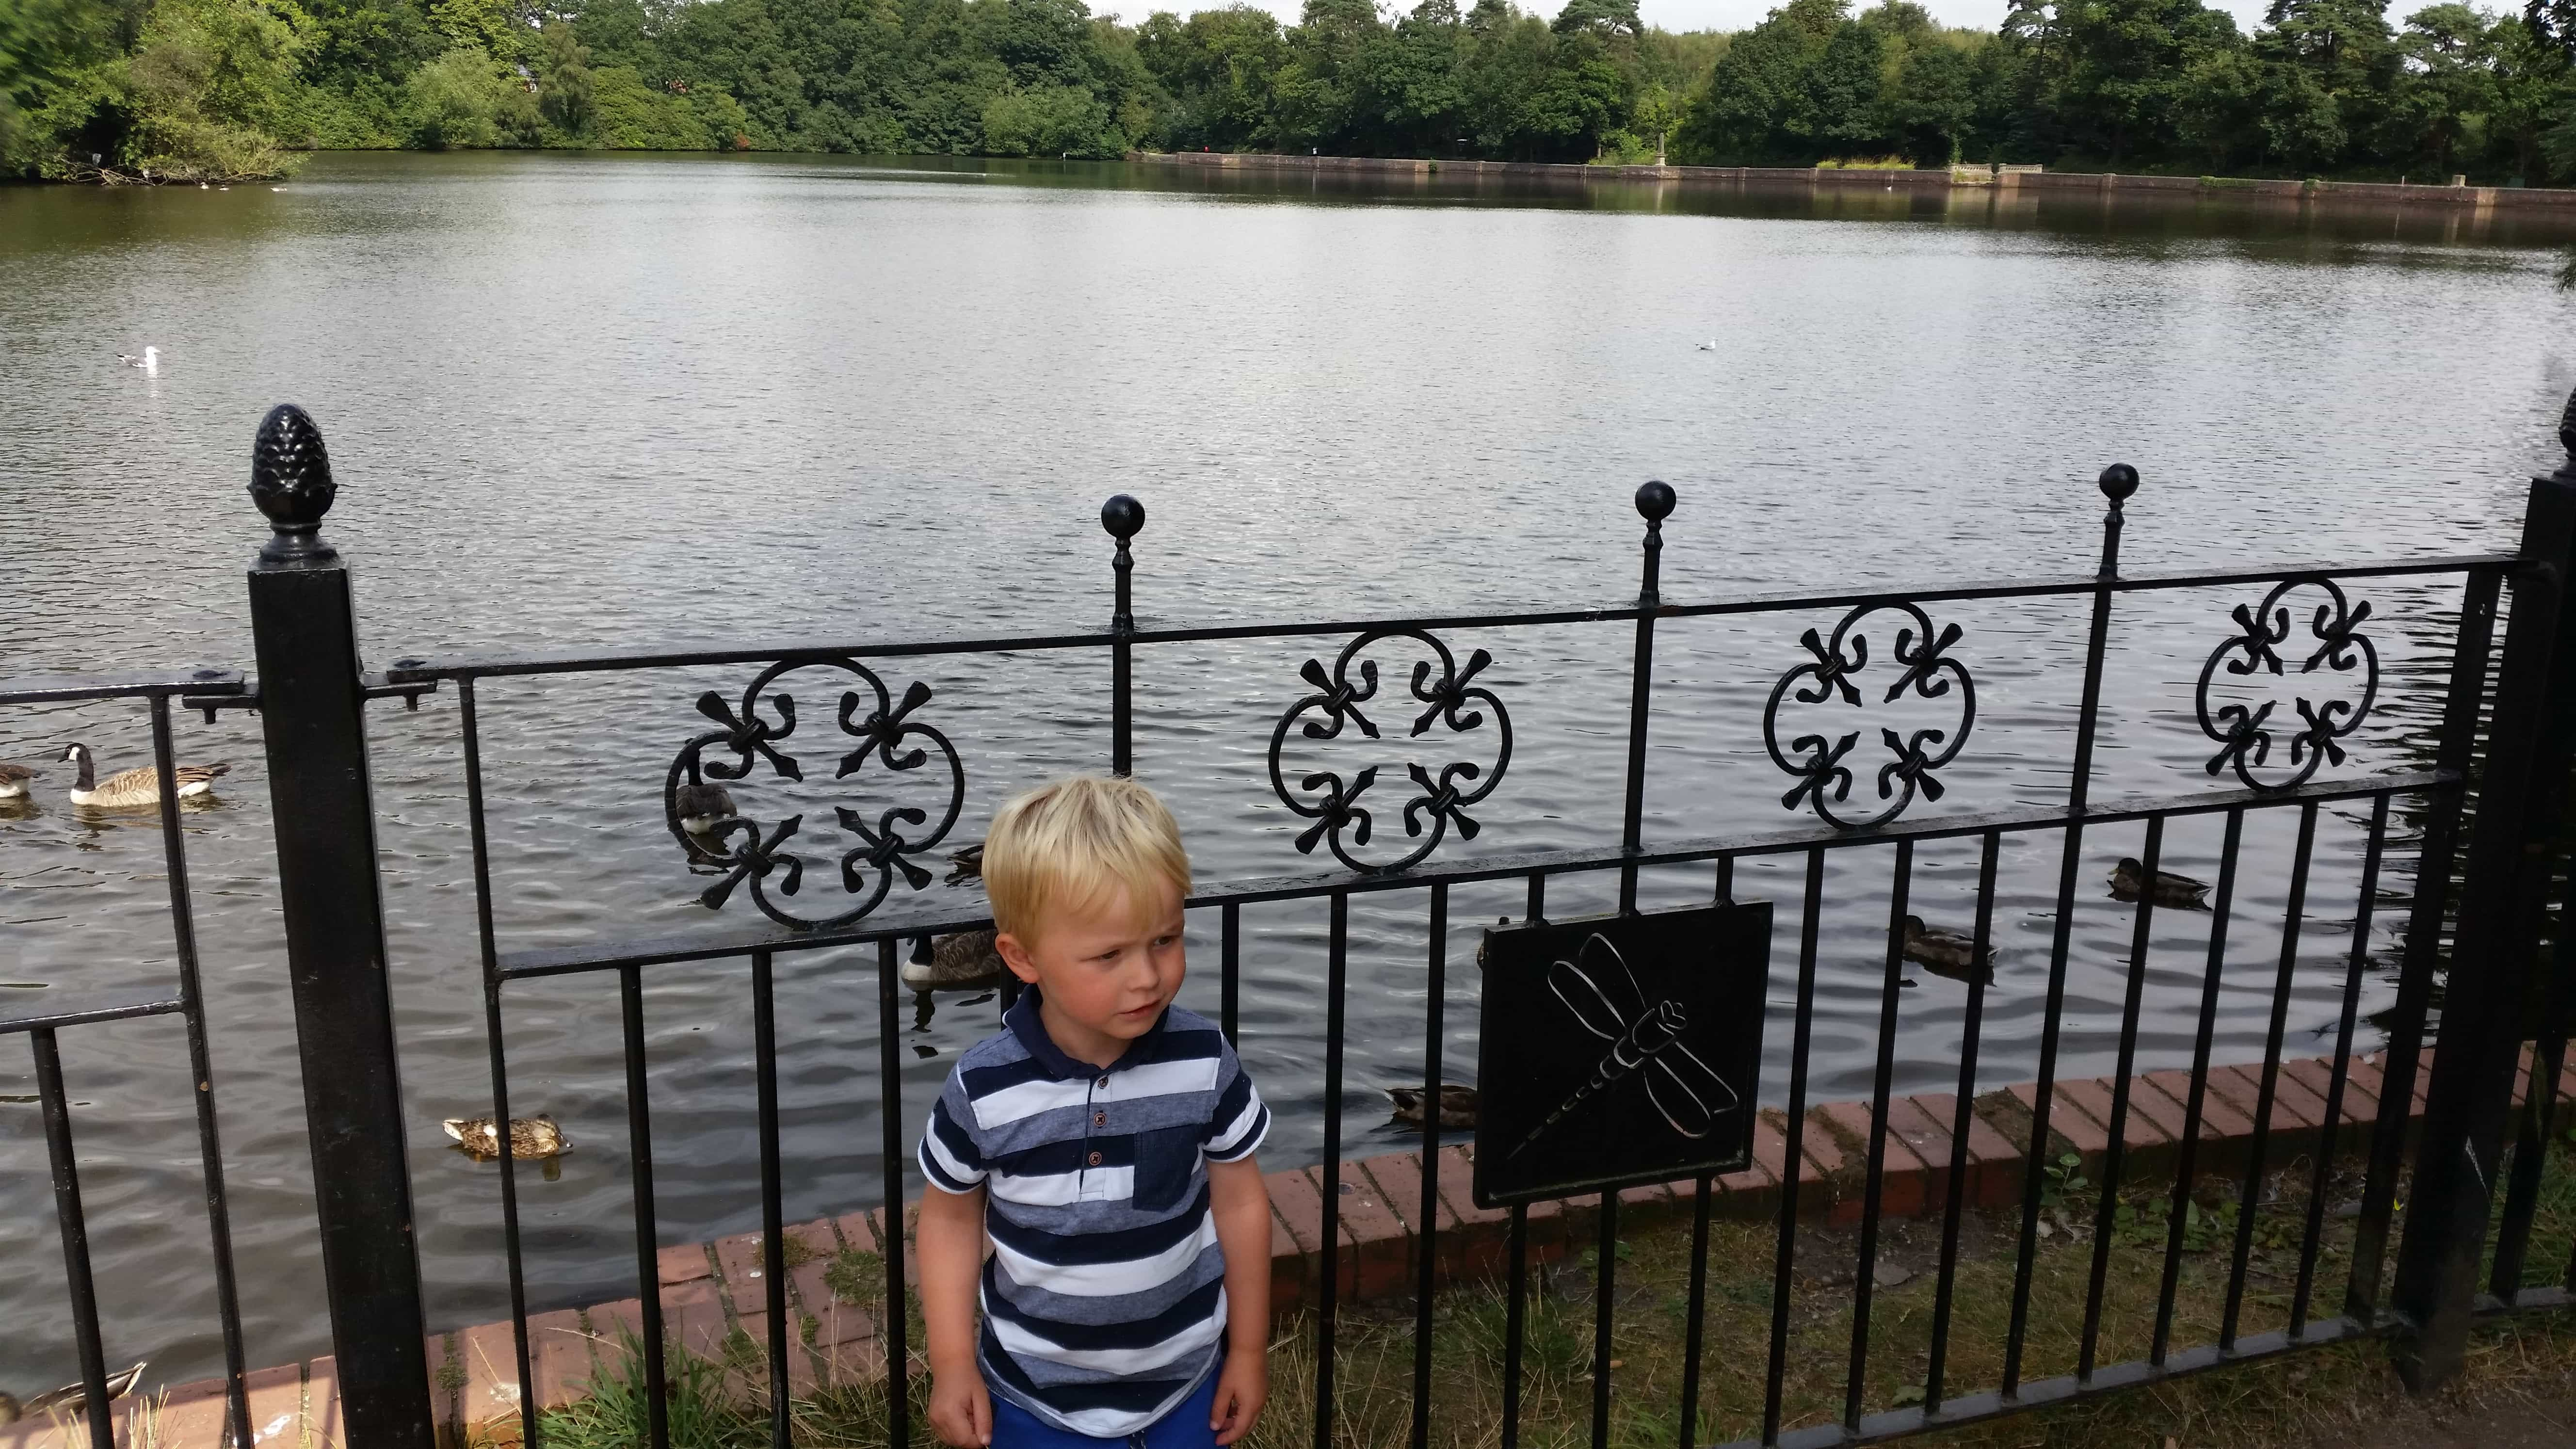 The large lake at Hartsholme